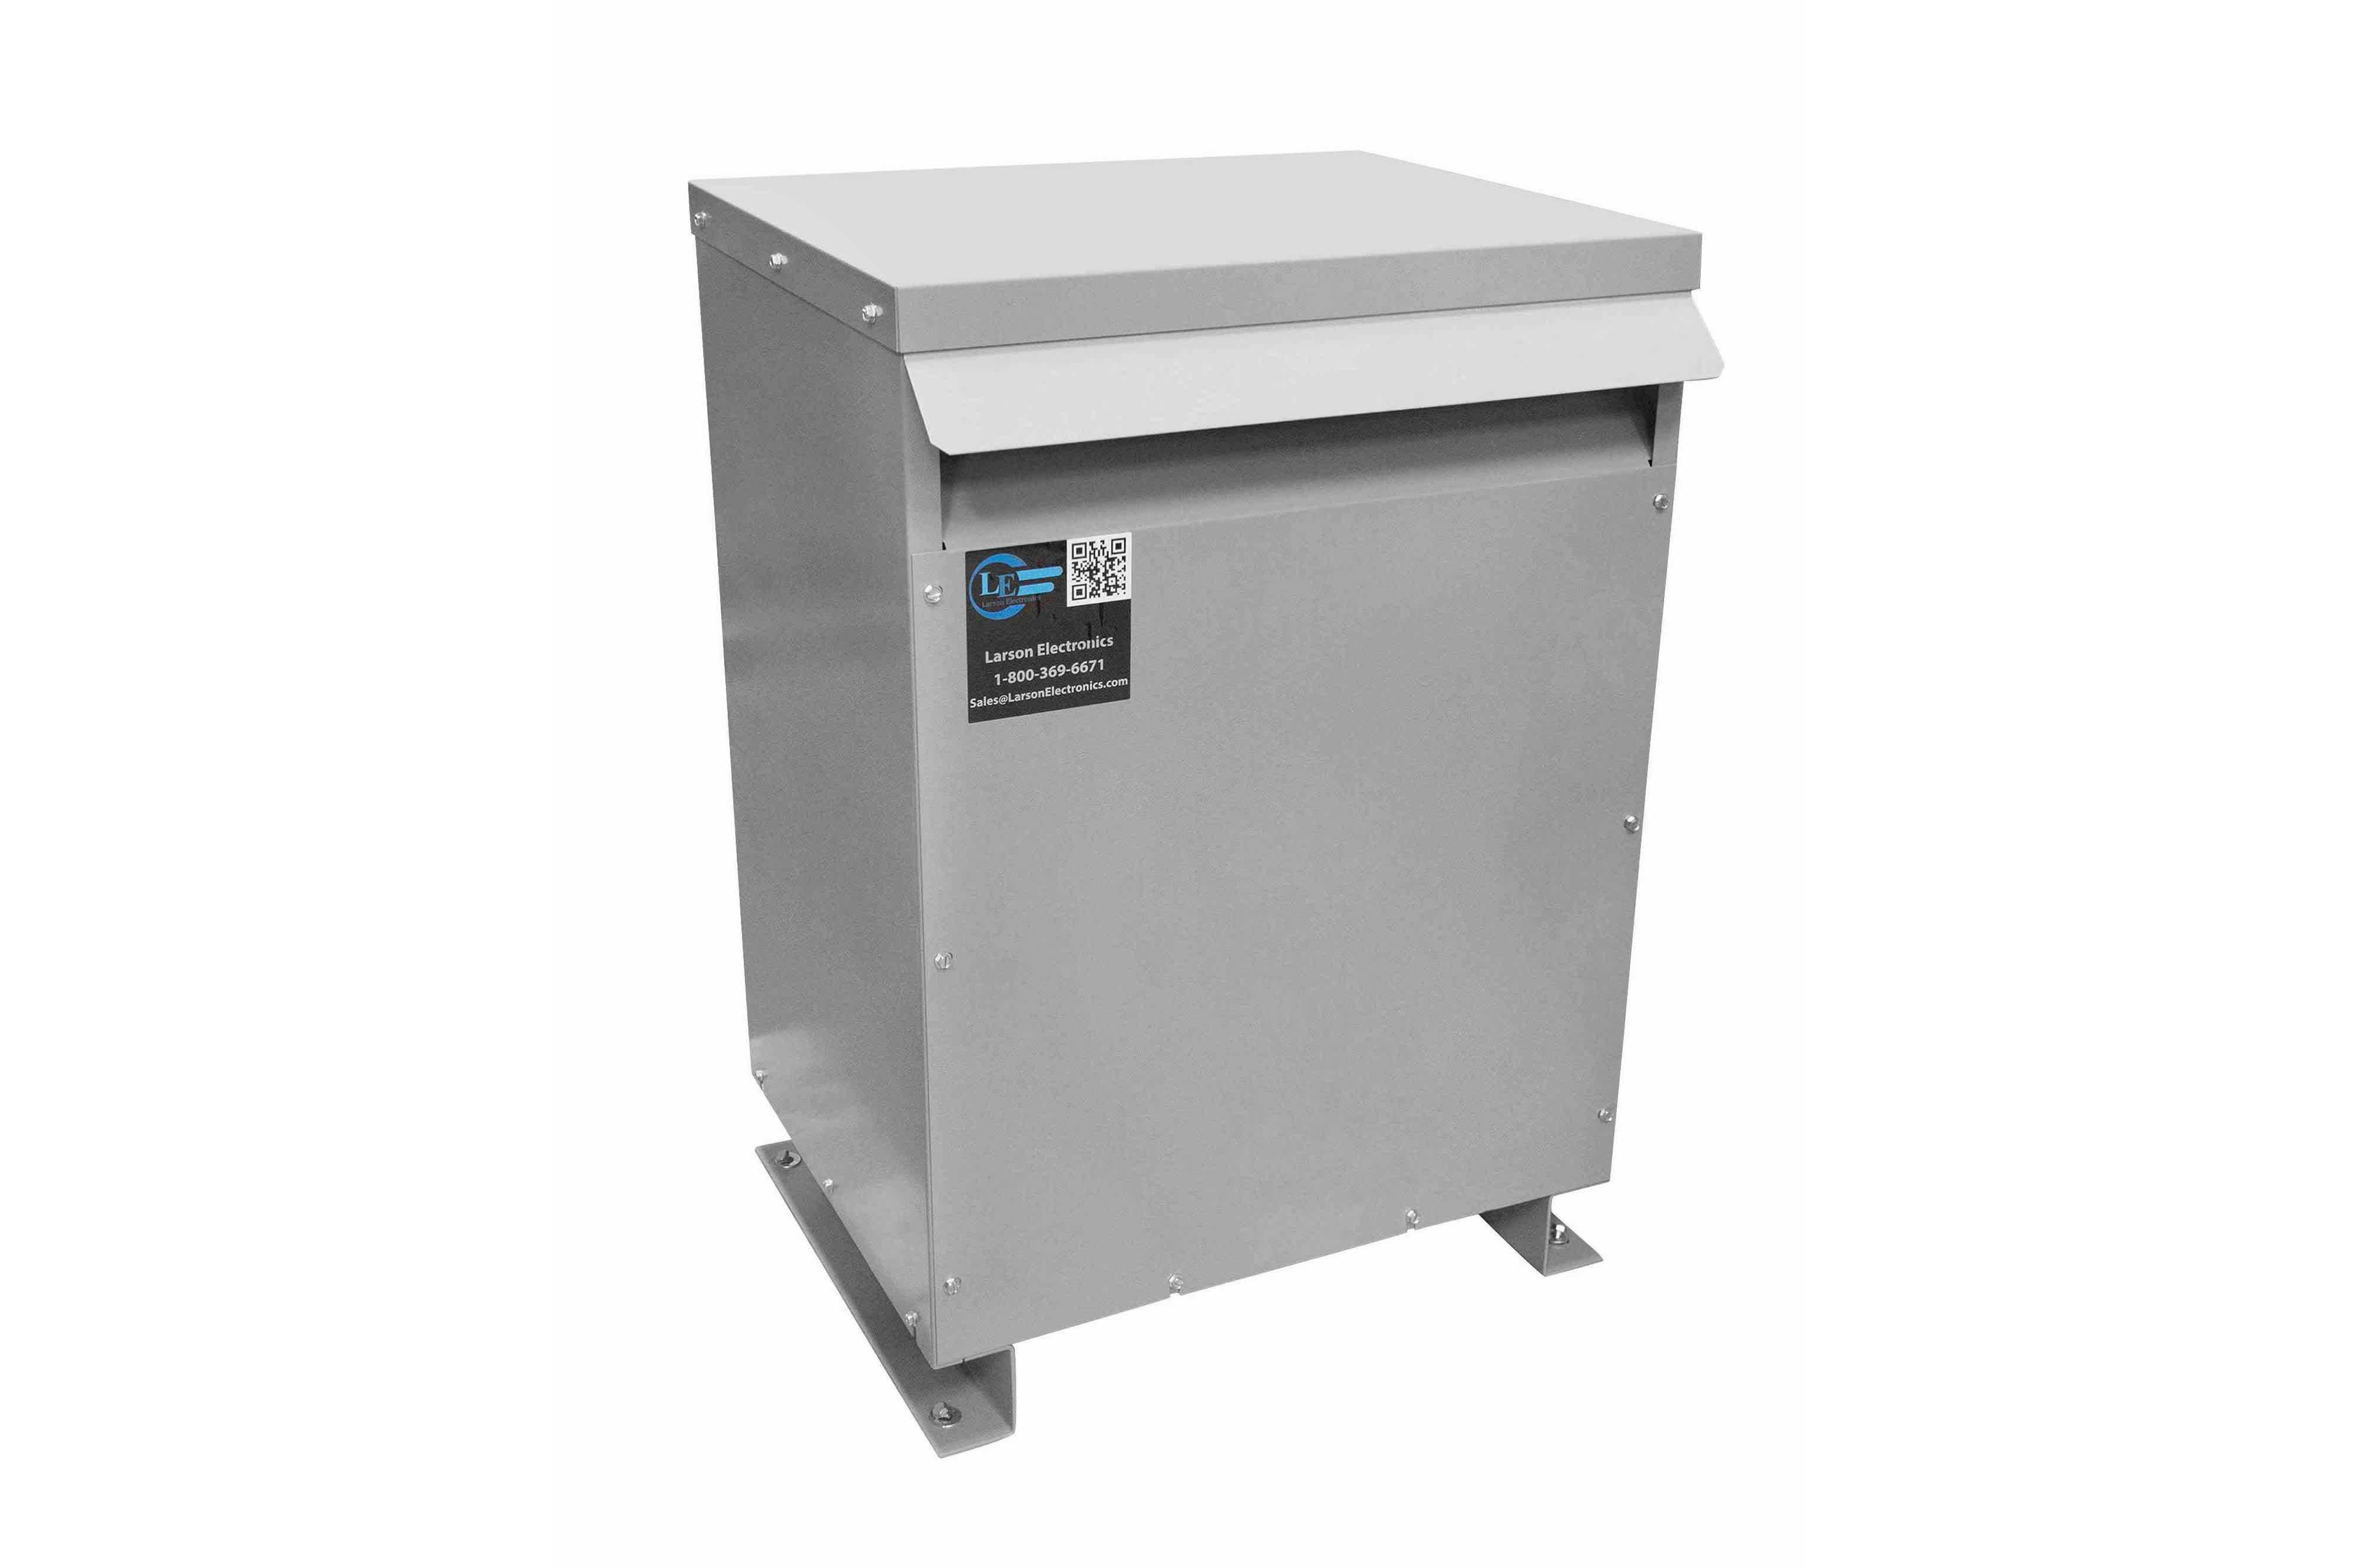 25 kVA 3PH Isolation Transformer, 480V Wye Primary, 415Y/240 Wye-N Secondary, N3R, Ventilated, 60 Hz